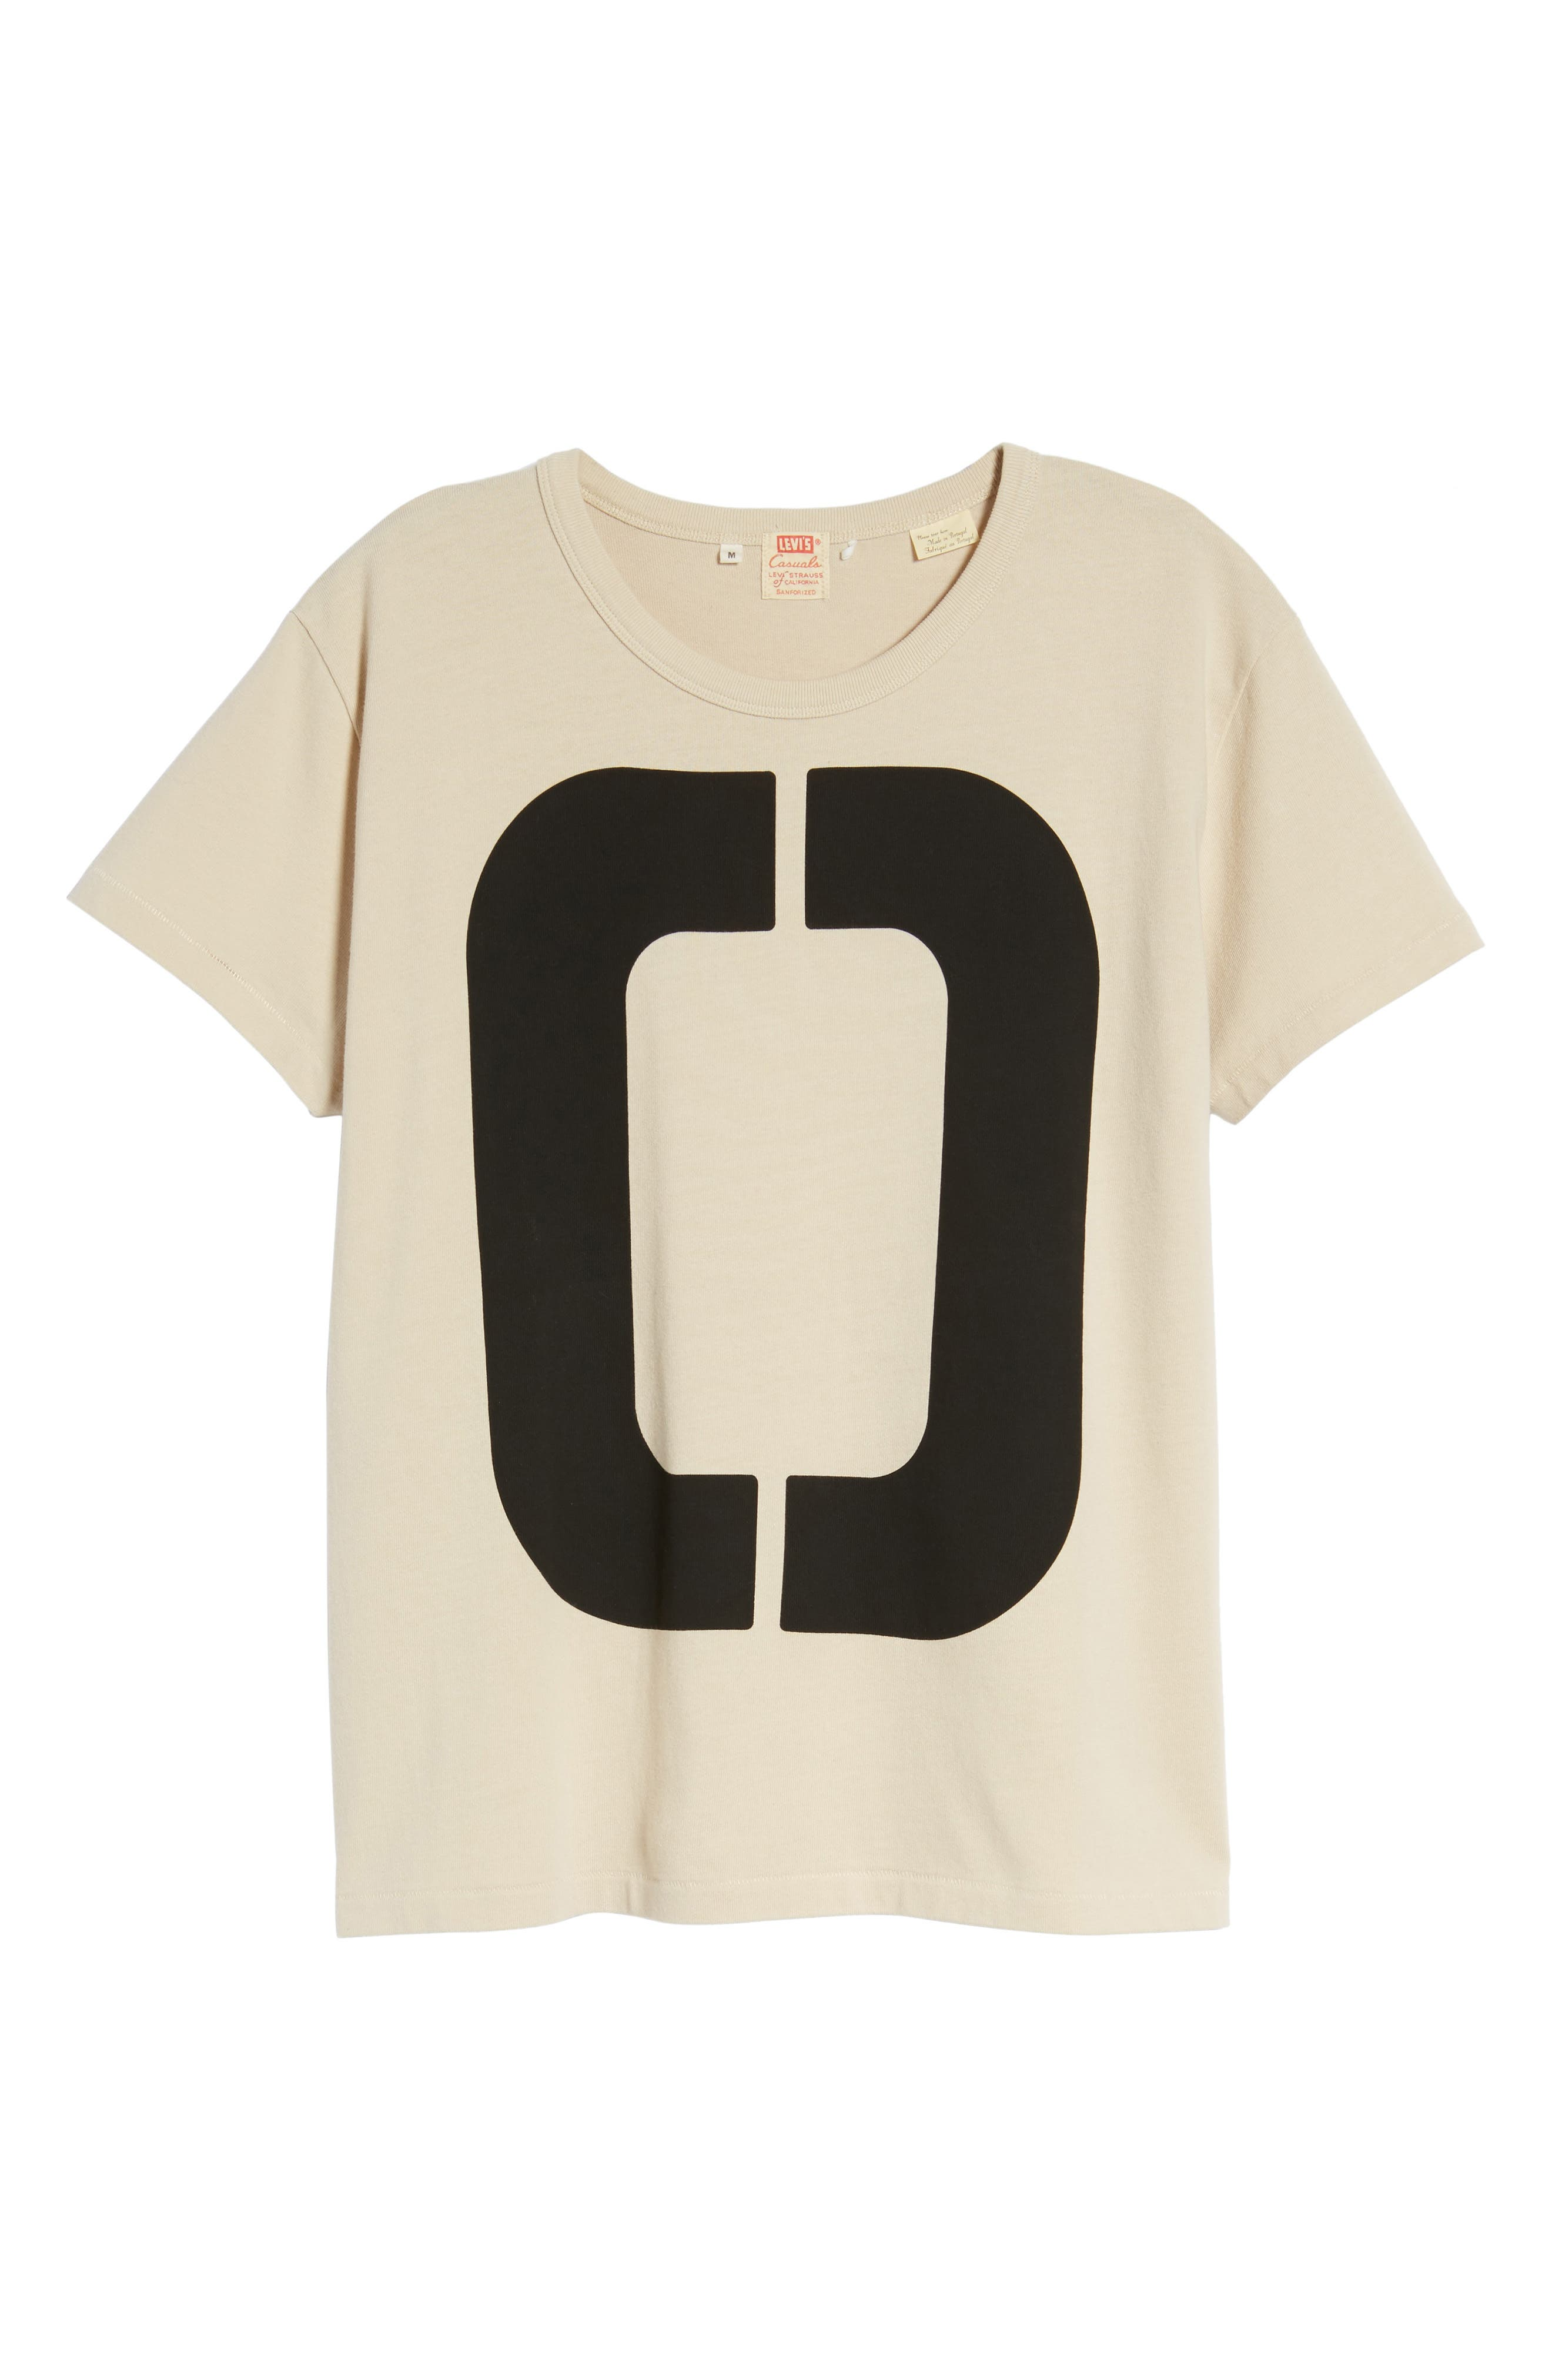 1960s Loose Graphic T-Shirt,                             Alternate thumbnail 6, color,                             Zero Sand Shell